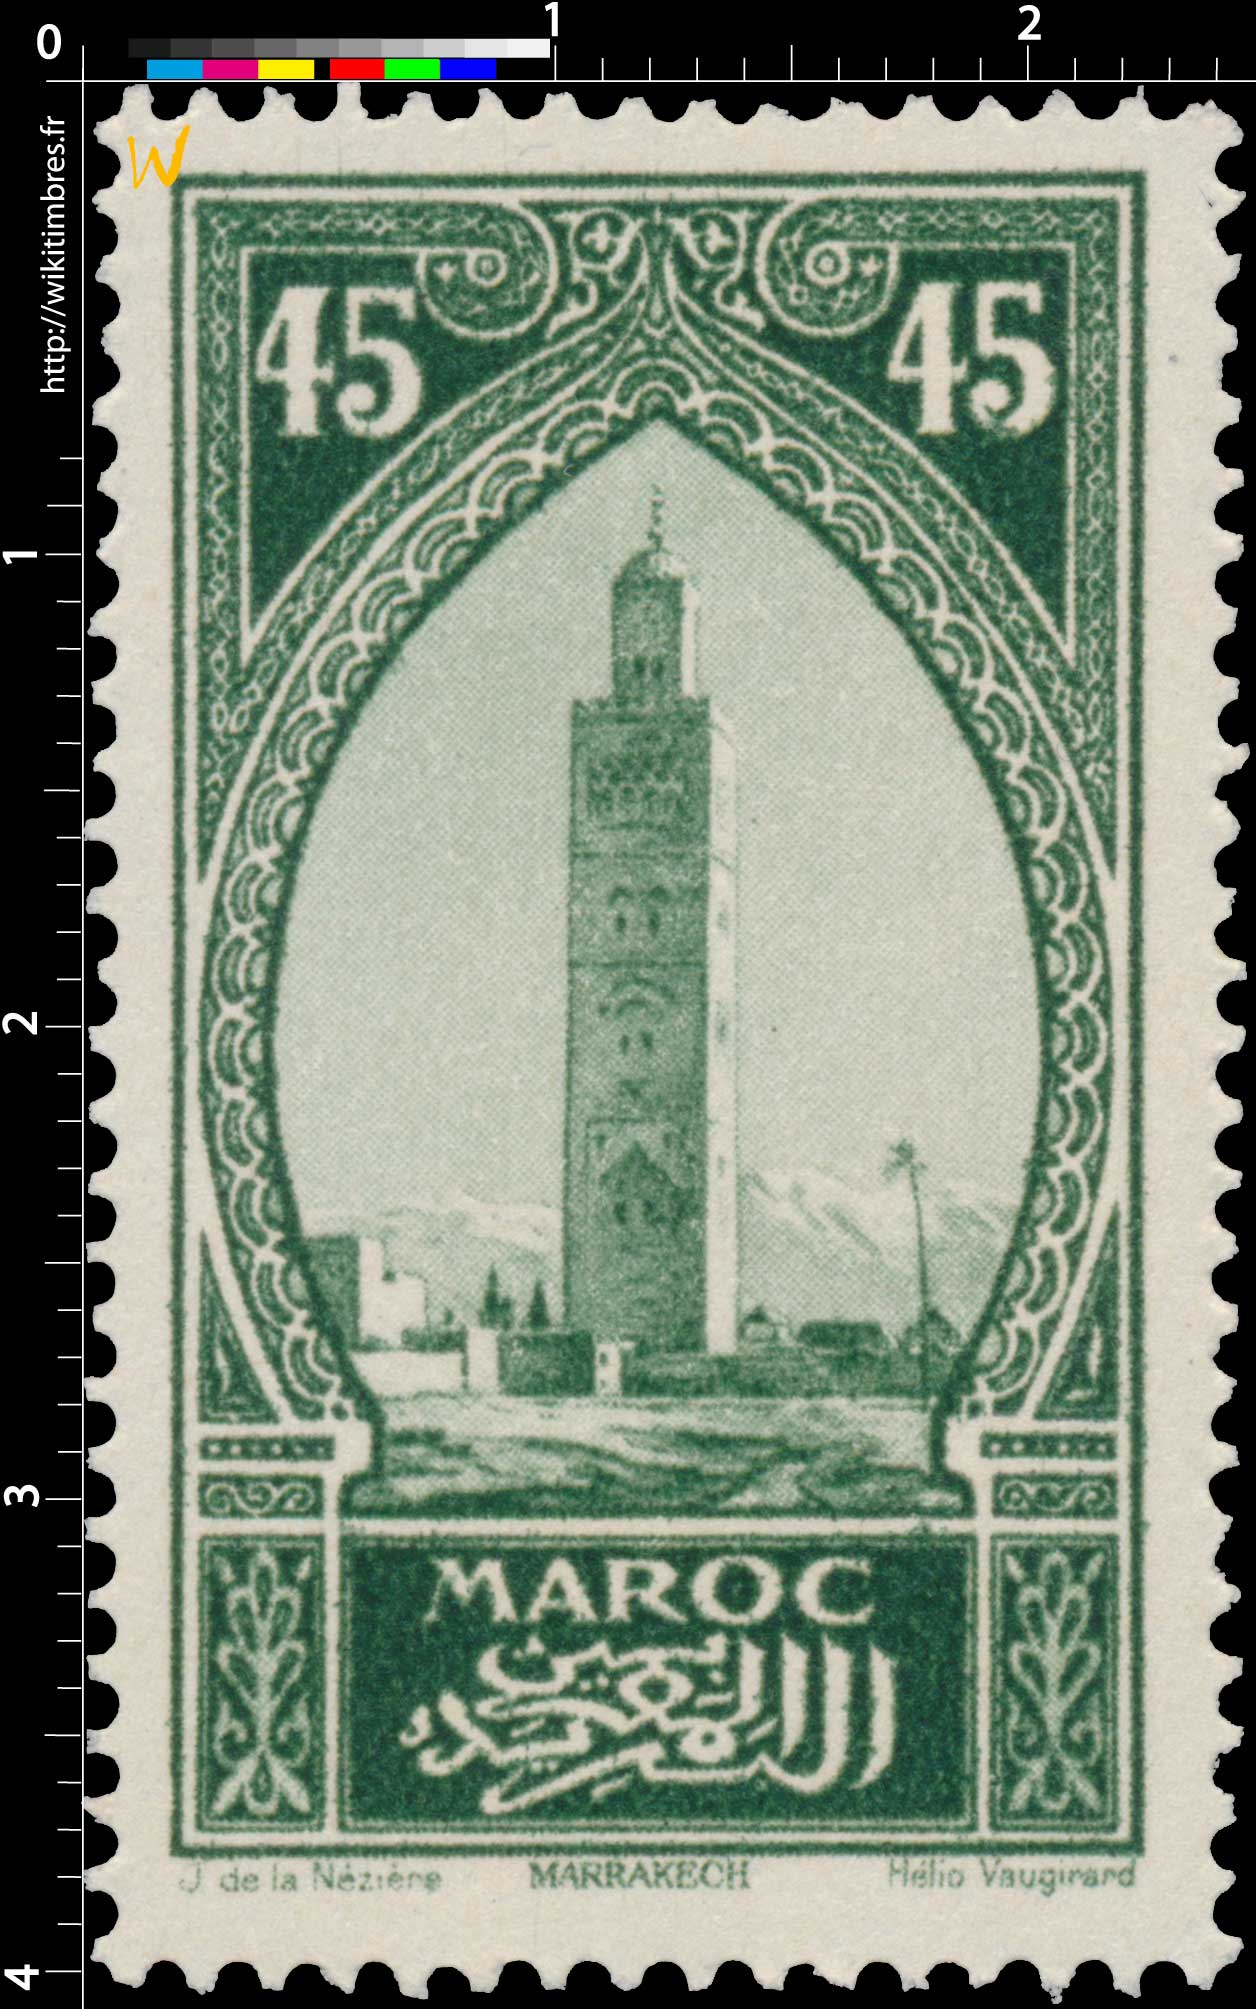 1923 Maroc - La Koutoubia - Marrakech